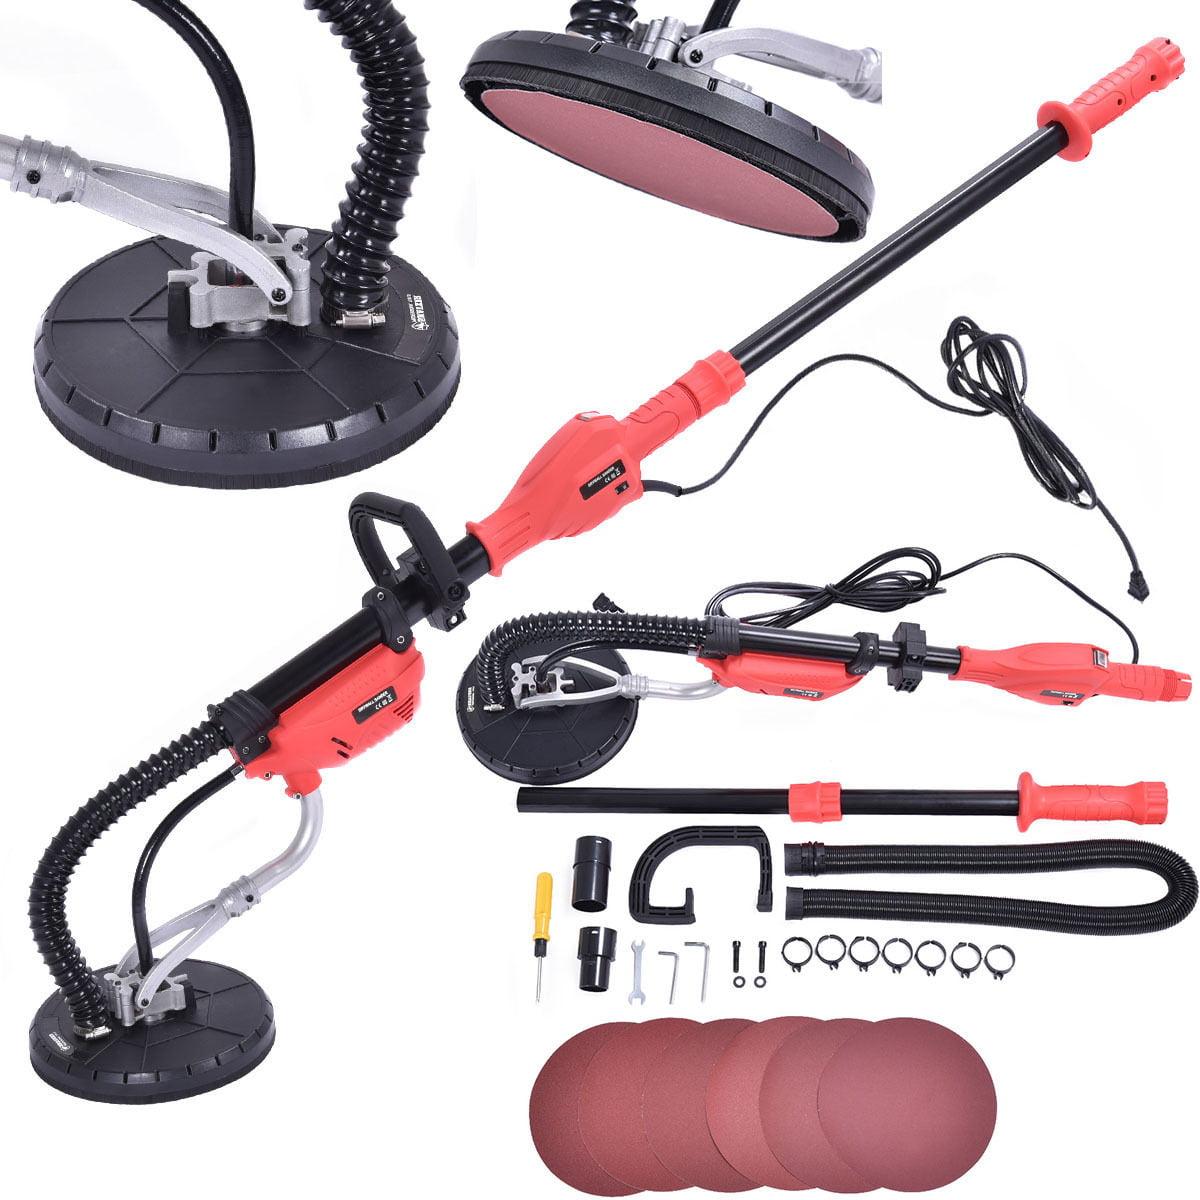 Costway Drywall Sander 750W Commercial Electric Adjustabl...